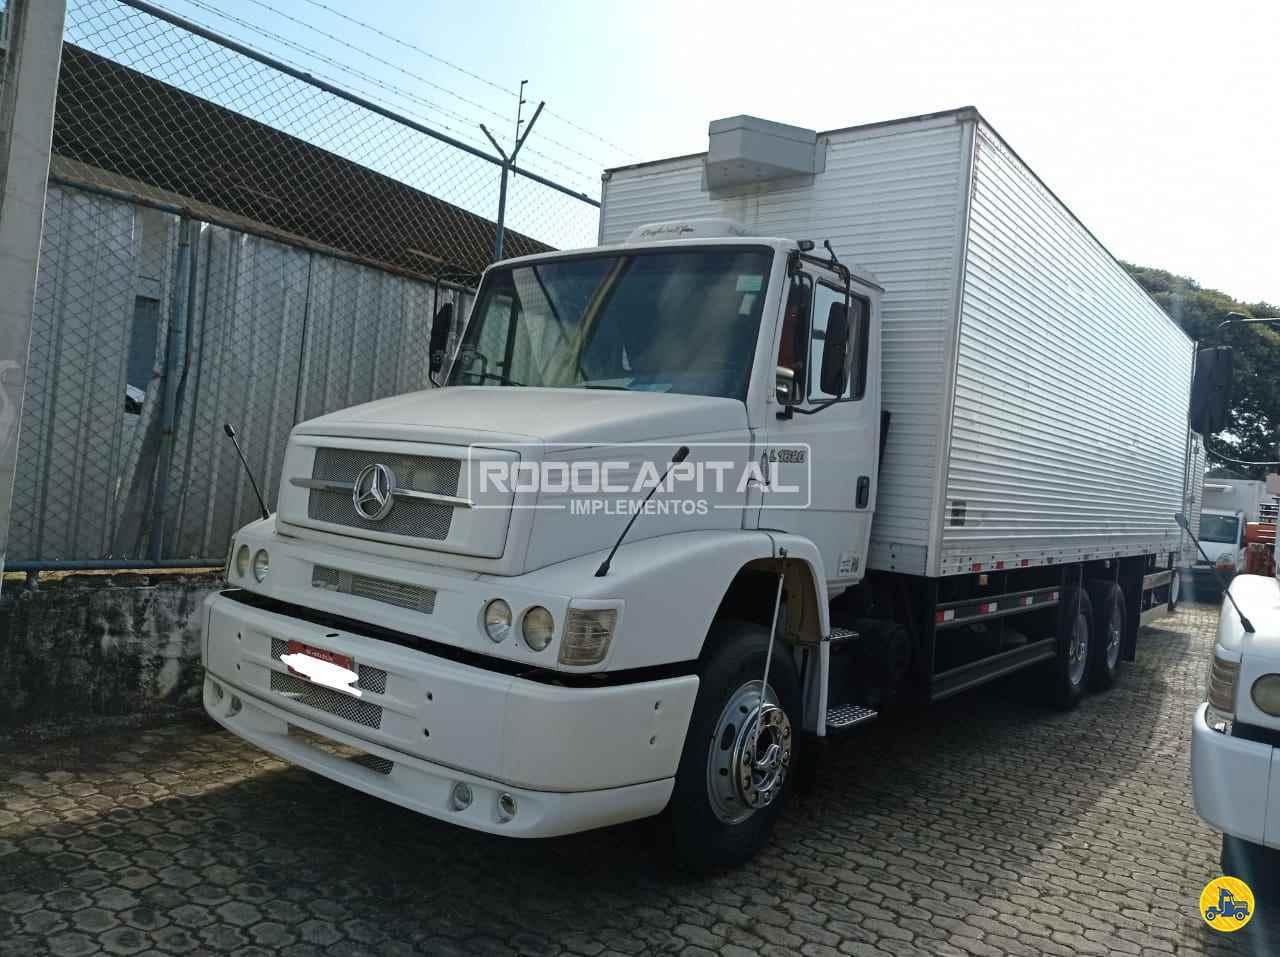 MB 1620 de RODOCAPITAL Implementos - BRASILIA/DF